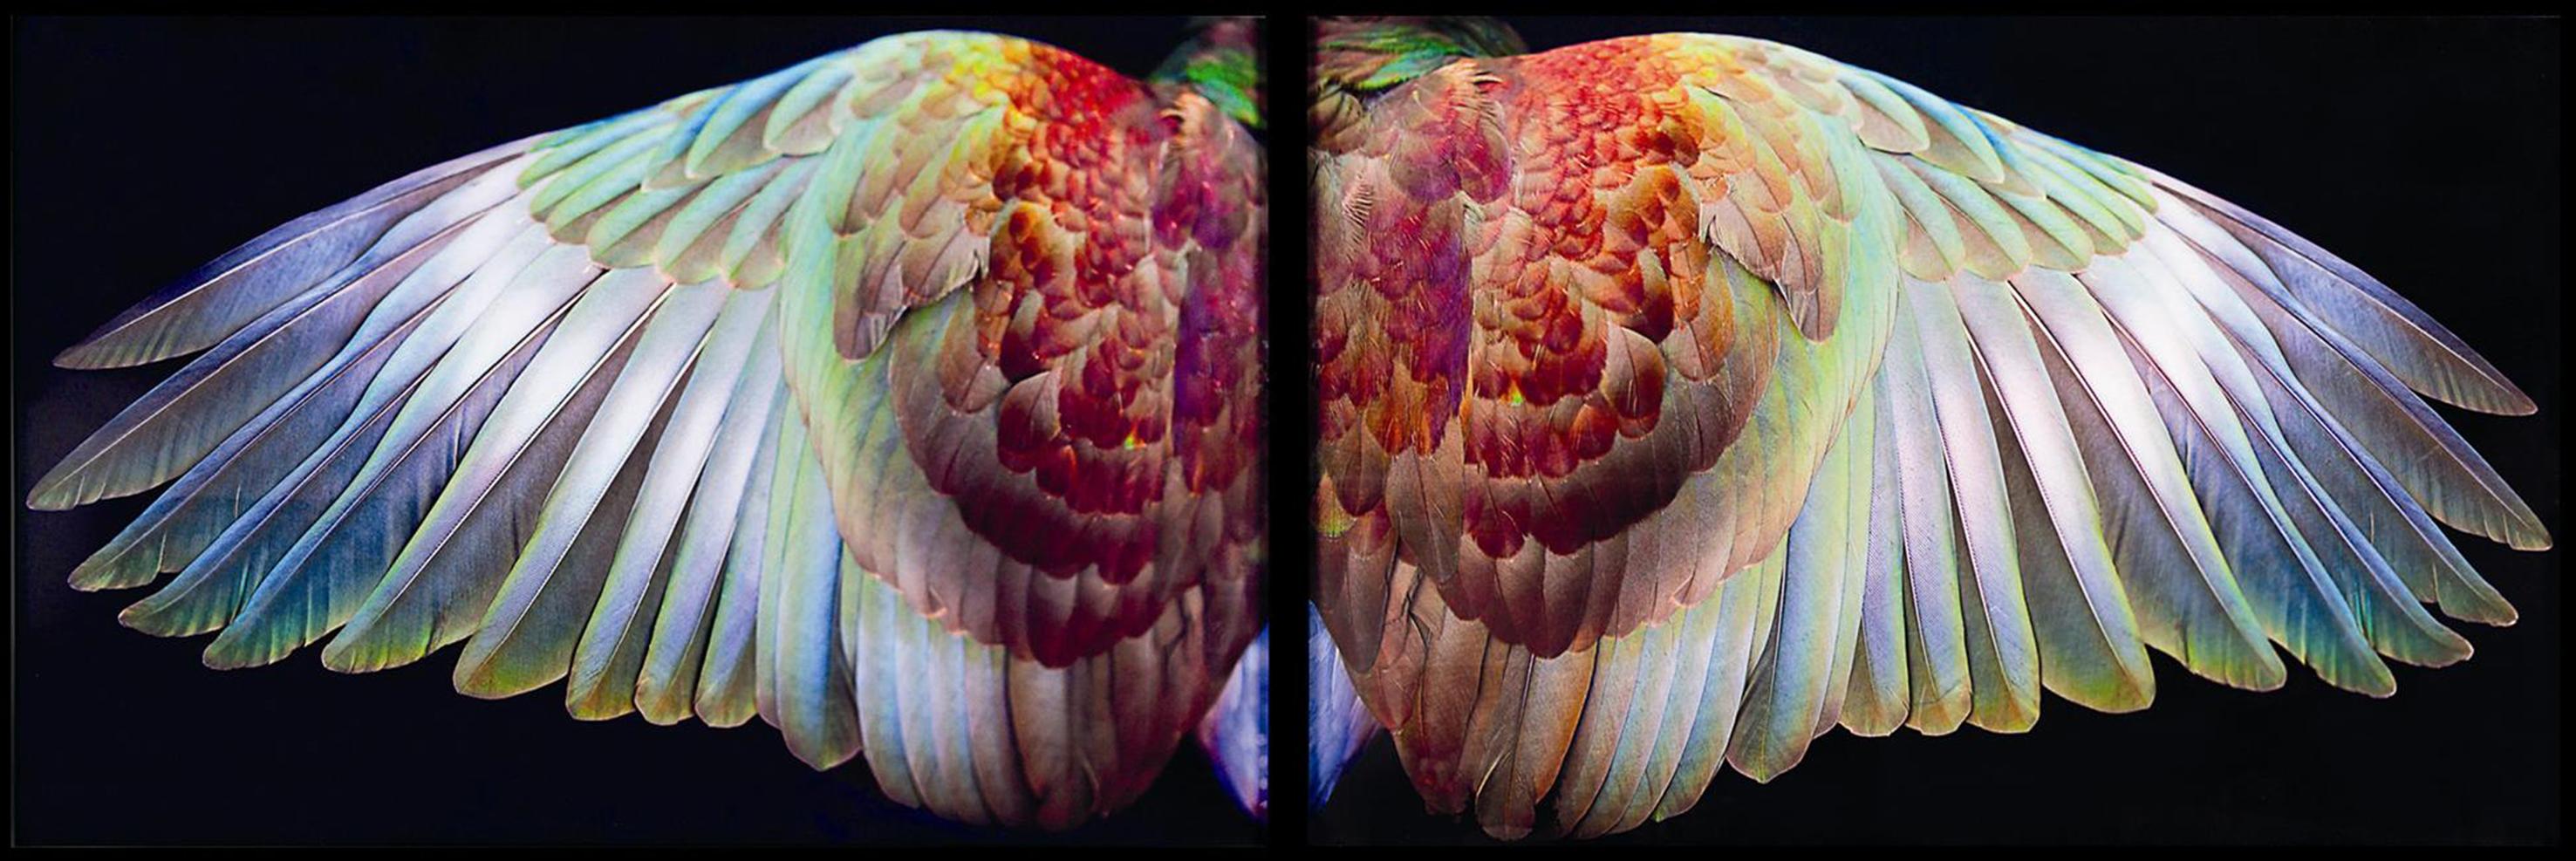 Fiona Pardington - Kereru Wings, Waiheke 2010, Pigment inks on Hahnemuhle Photo Rag